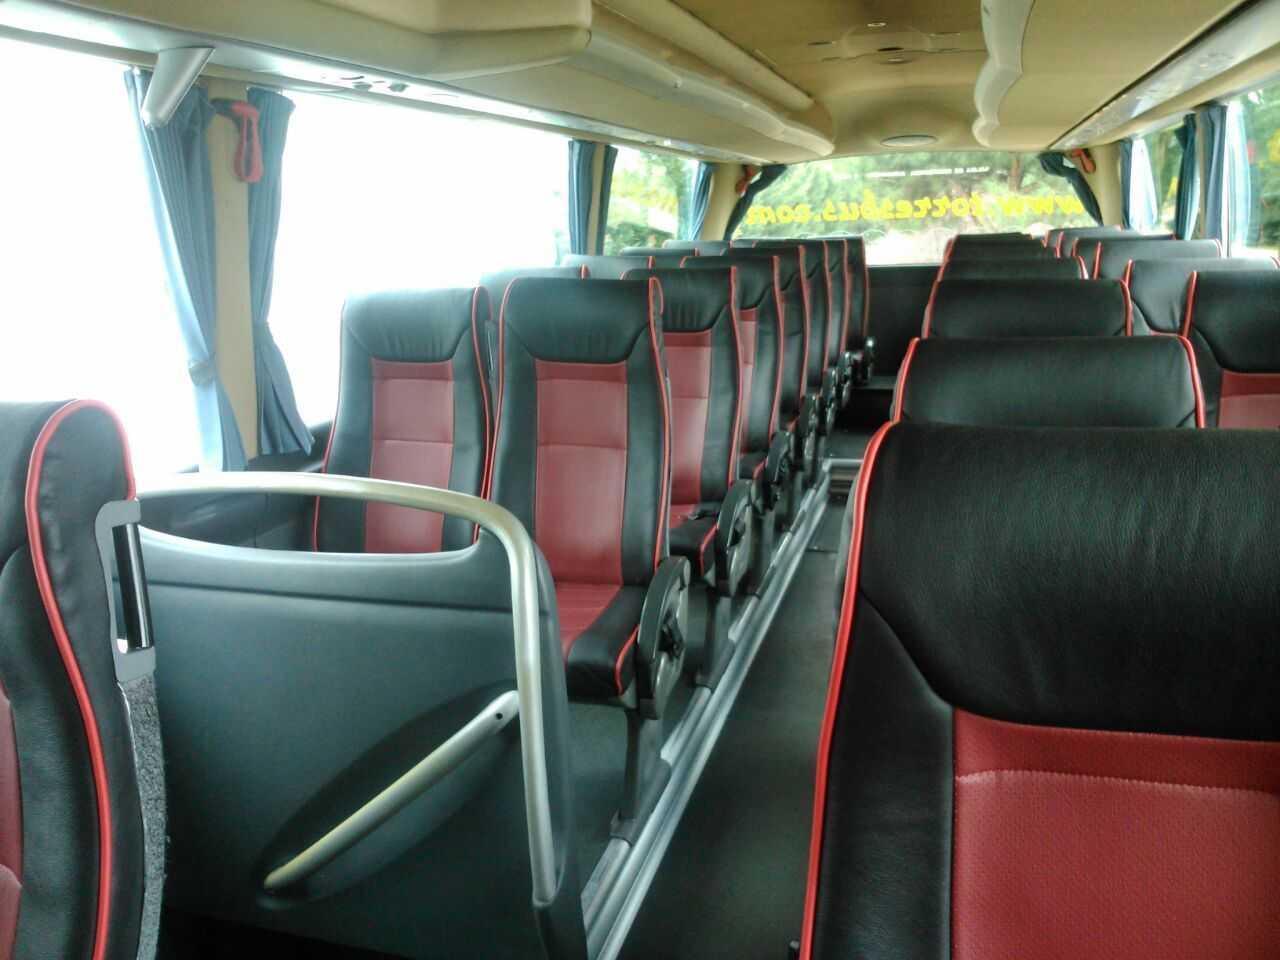 autobus alquiler : ¿qué comodidades podemos esperar?